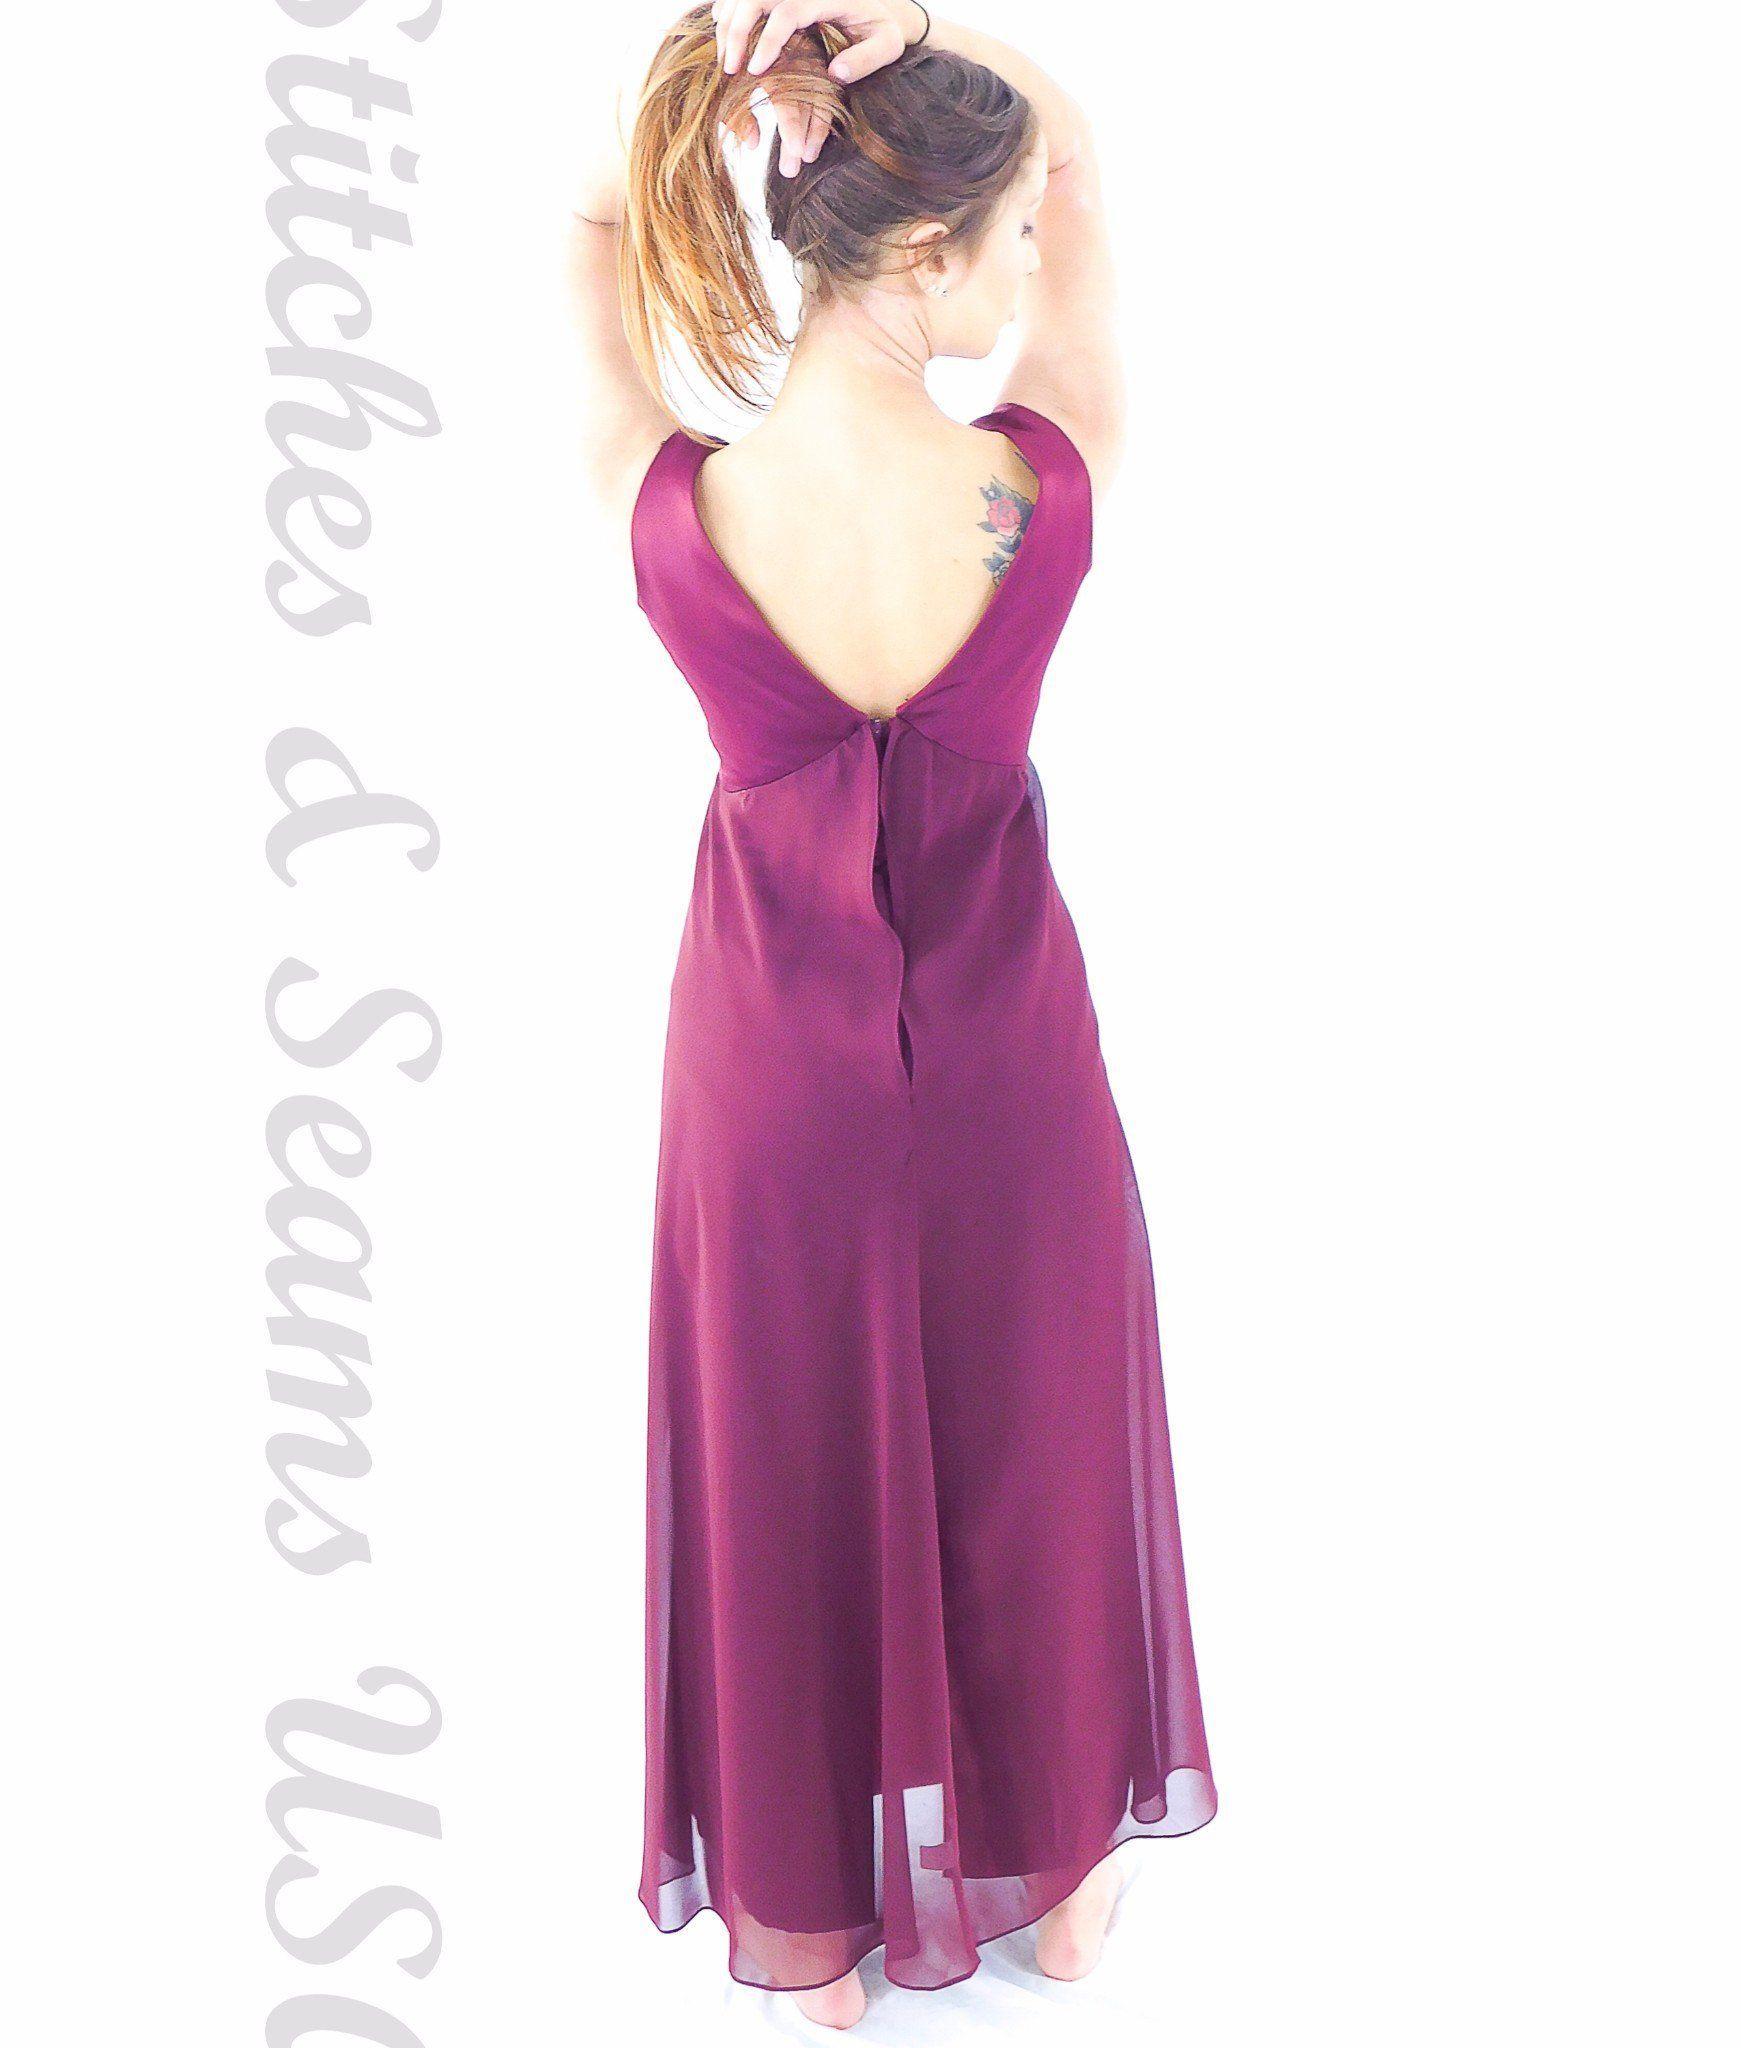 Formal Prom Dress Dark Burgundy Red Sleeveless V Neck Fancy Dine Gown Zip Up